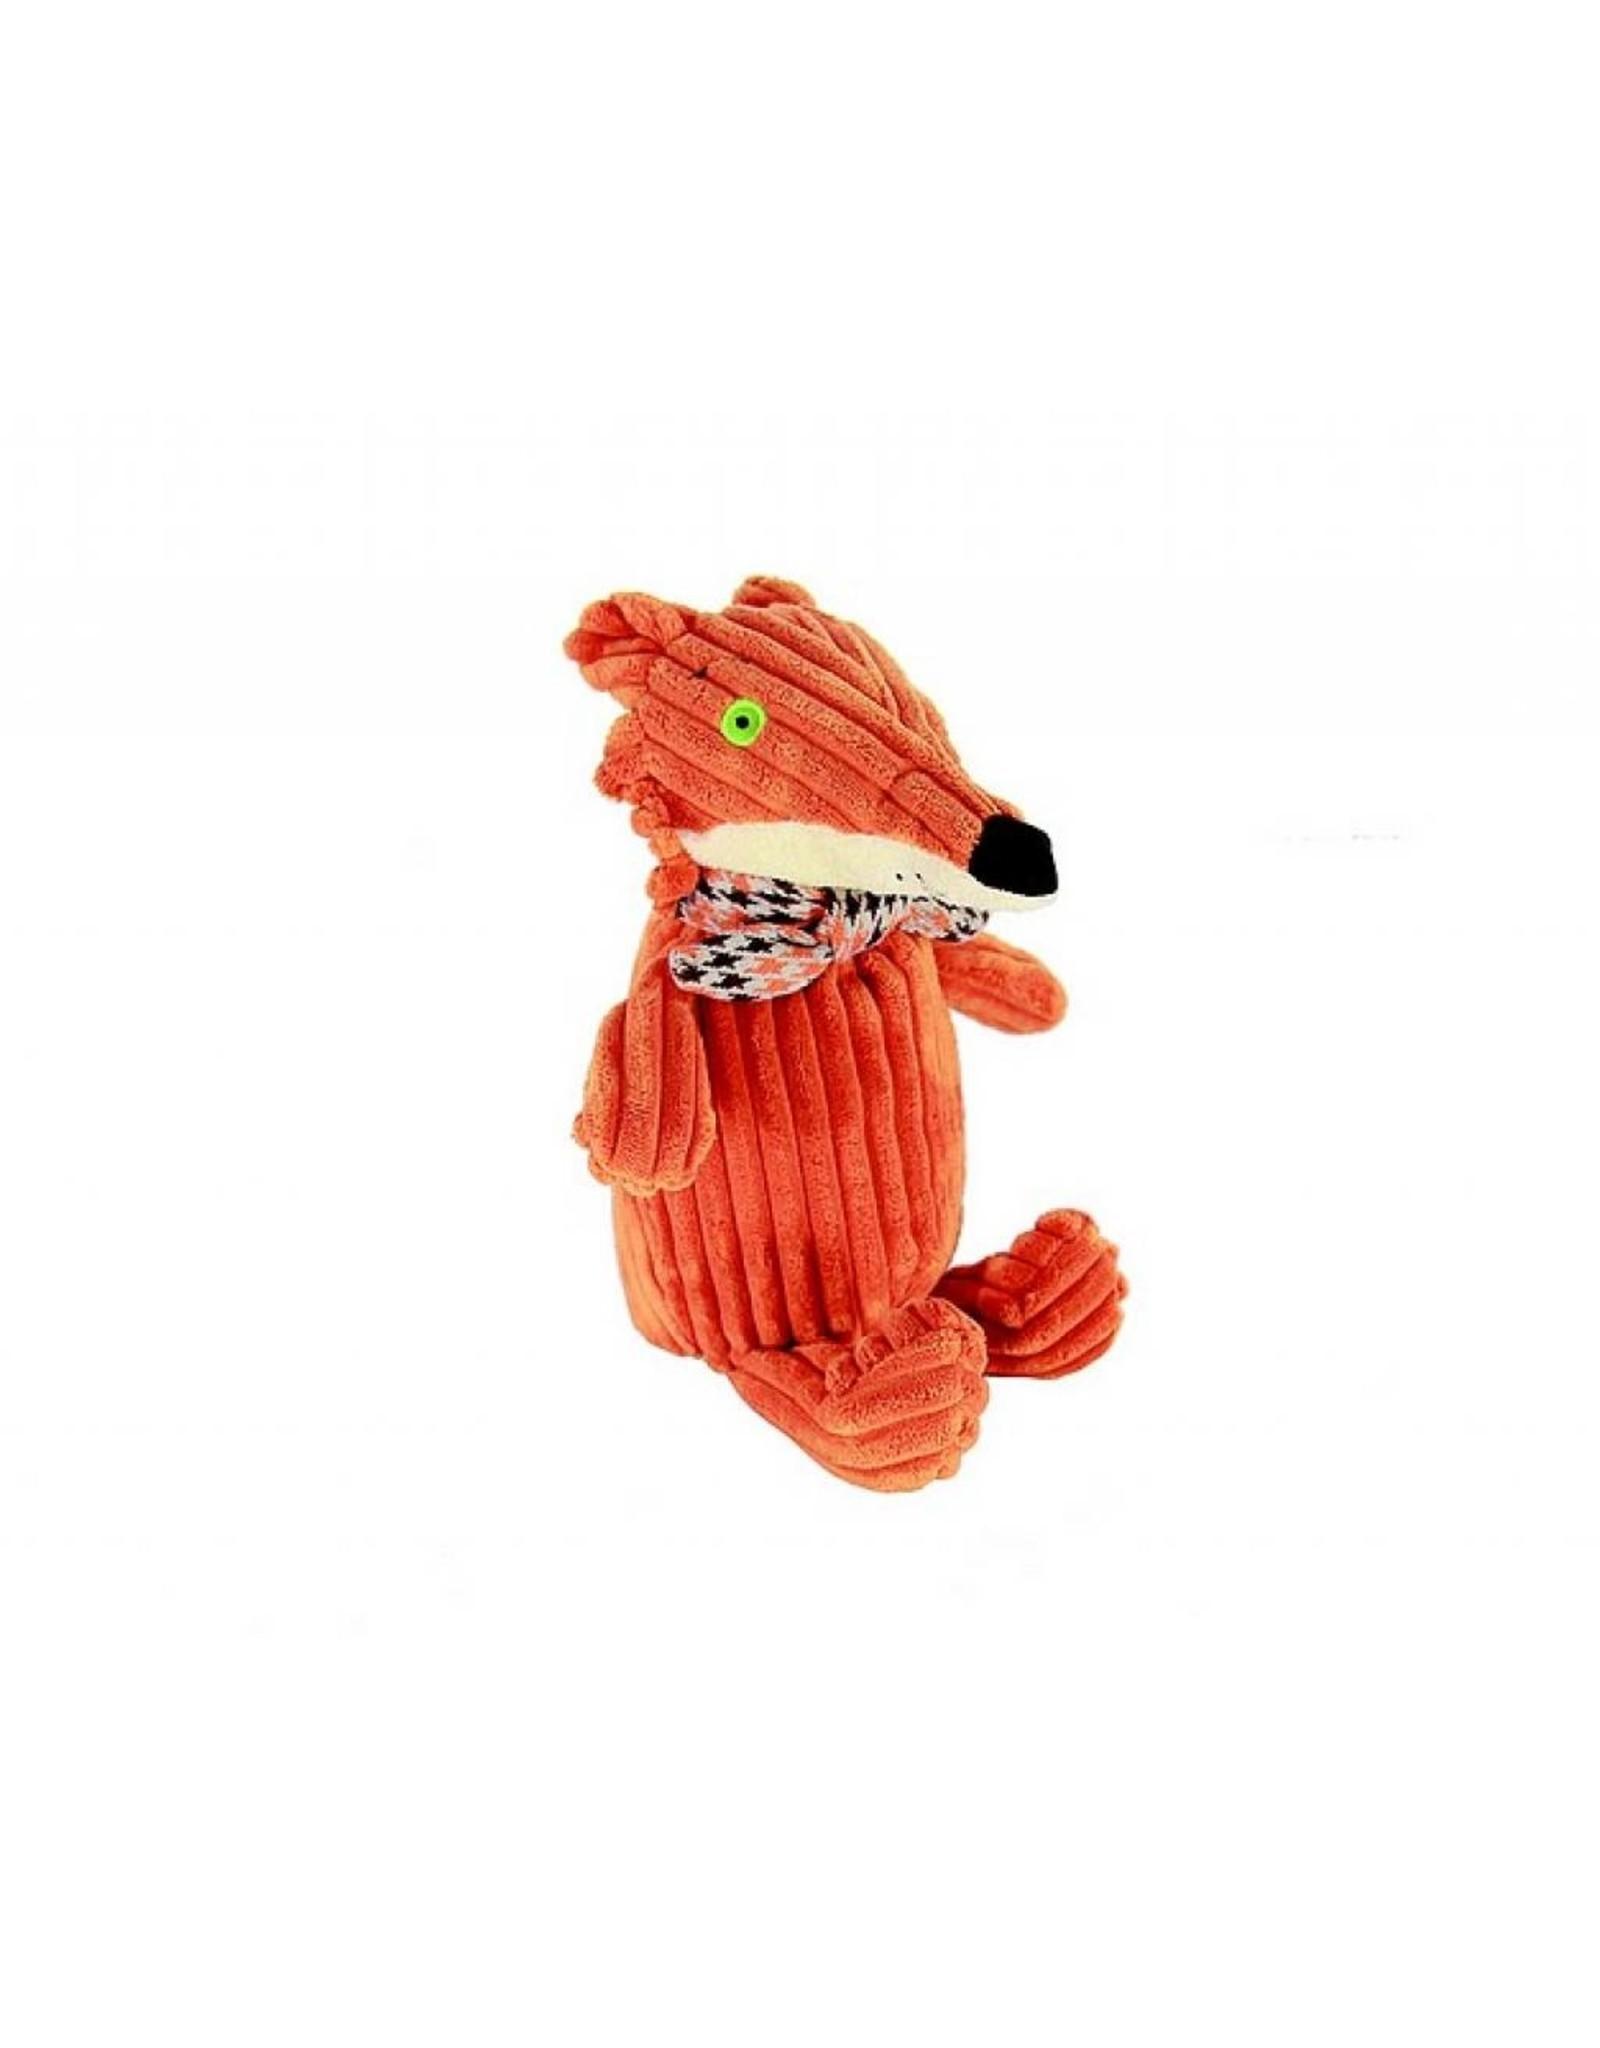 Deglingos stuffed animal - Kitschos the fox - simply collection